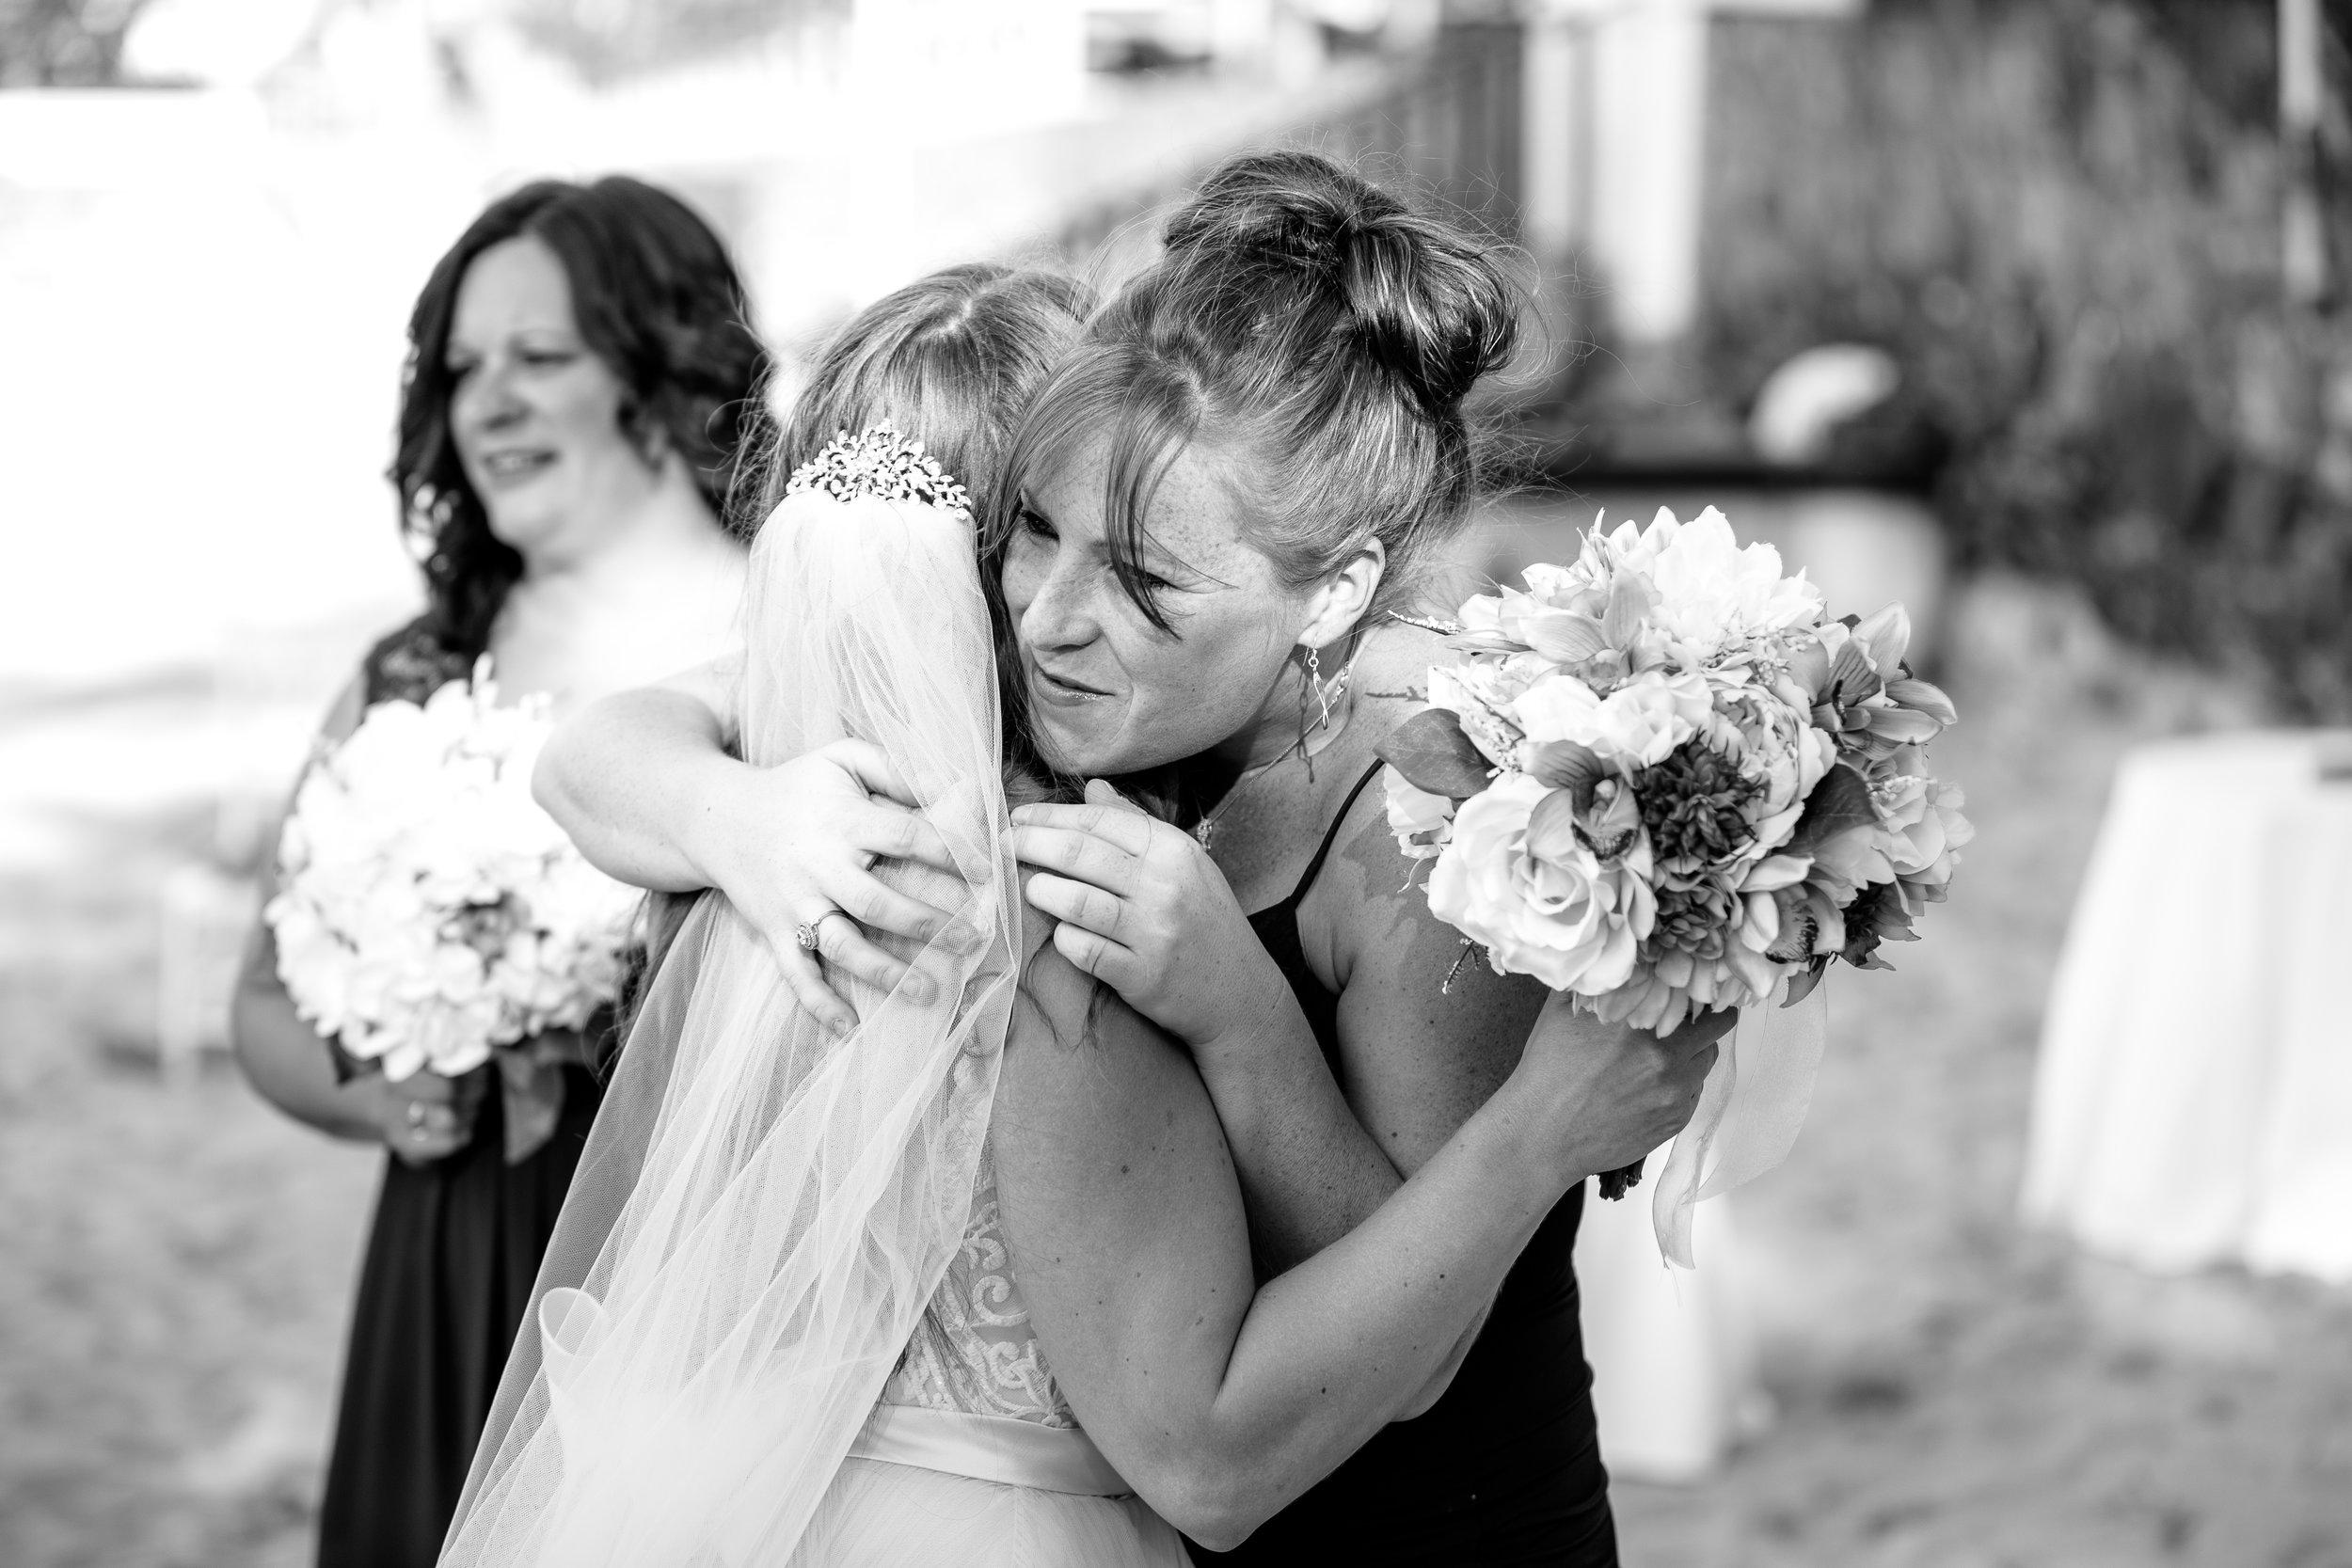 nicole-daacke-photography-destination-wedding-in-st-lucia-sandals-la-toc-intimate-island-wedding-carribean-elopement-photographer-chill-island-wedding-79.jpg